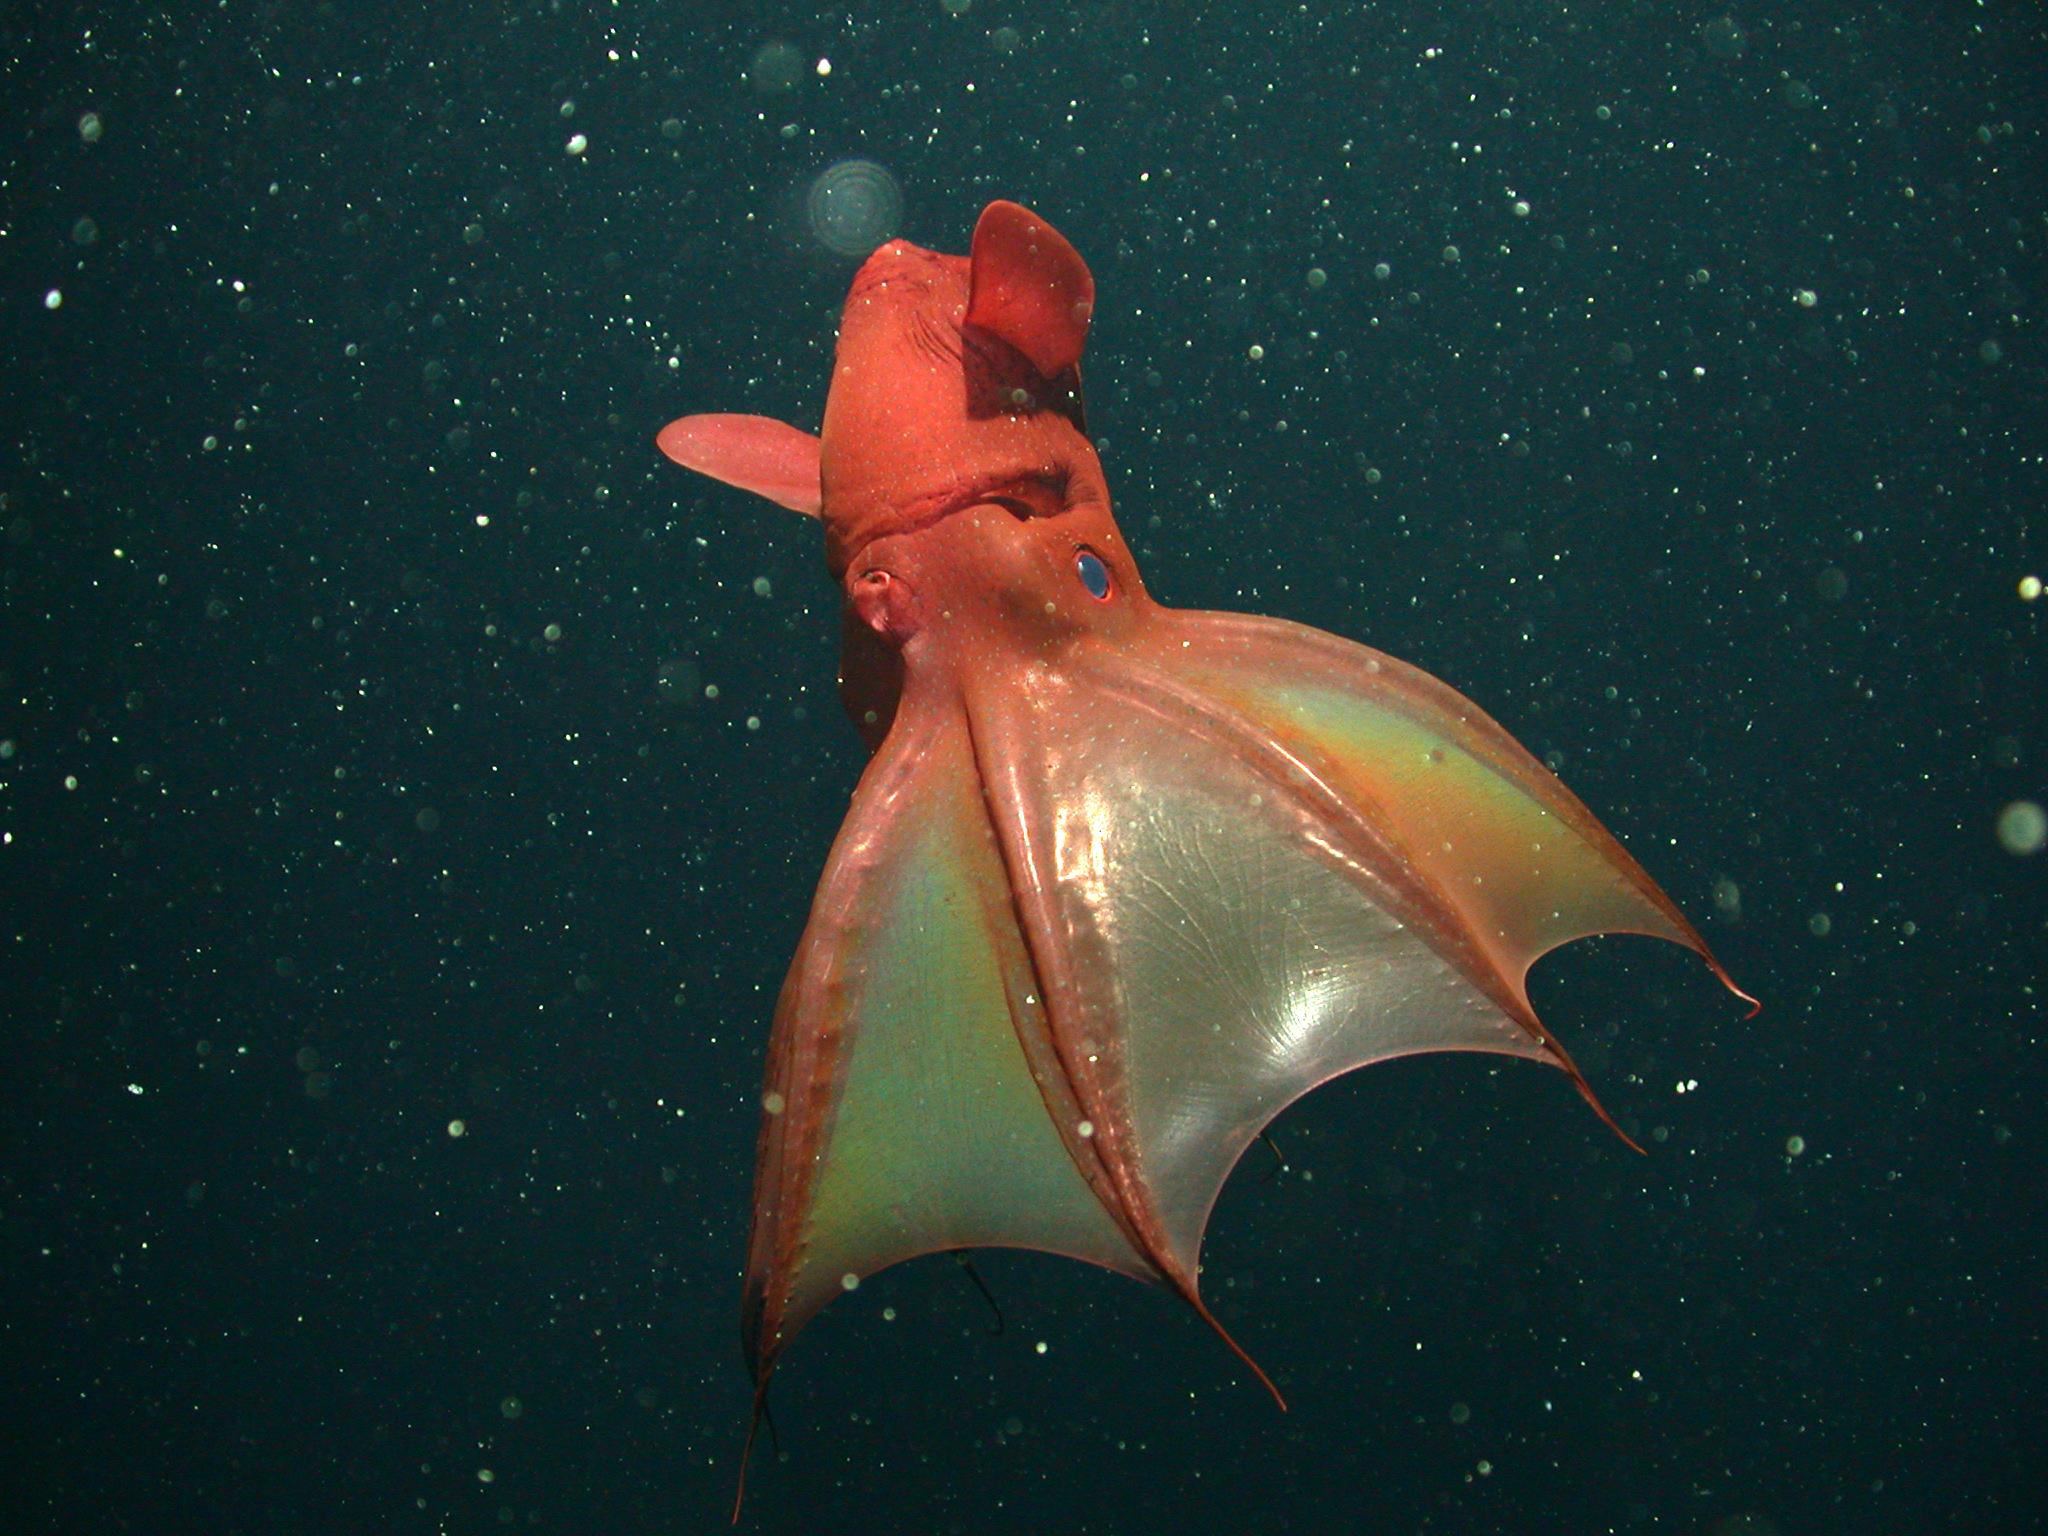 <em>Vampyroteuthis infernalis</em><br>Vampire squid